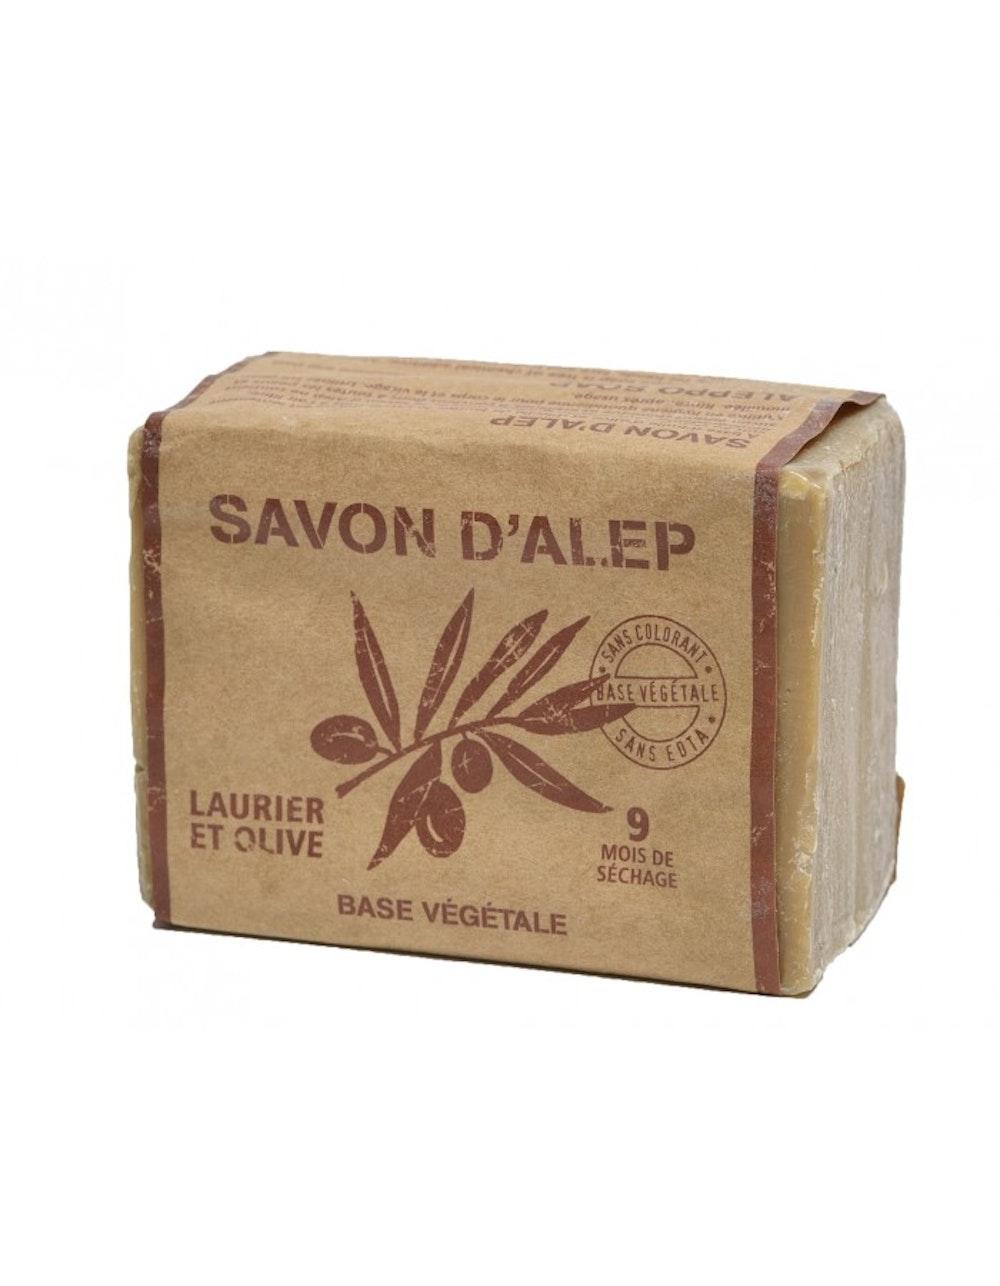 savon d'alep a montreal